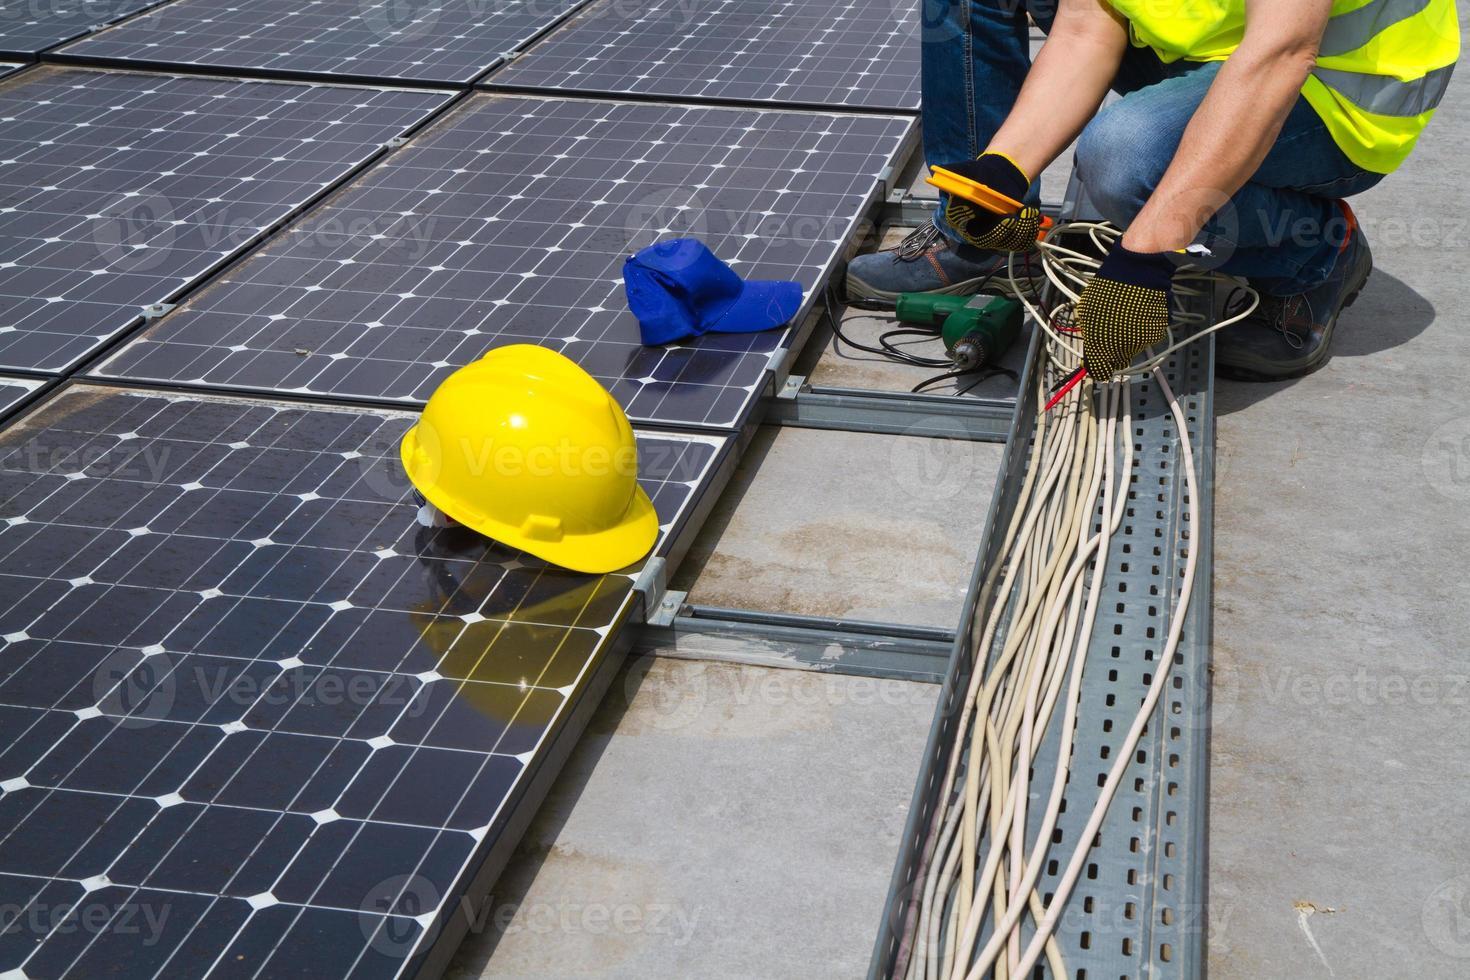 fotovoltaïsche geschoolde werknemer foto